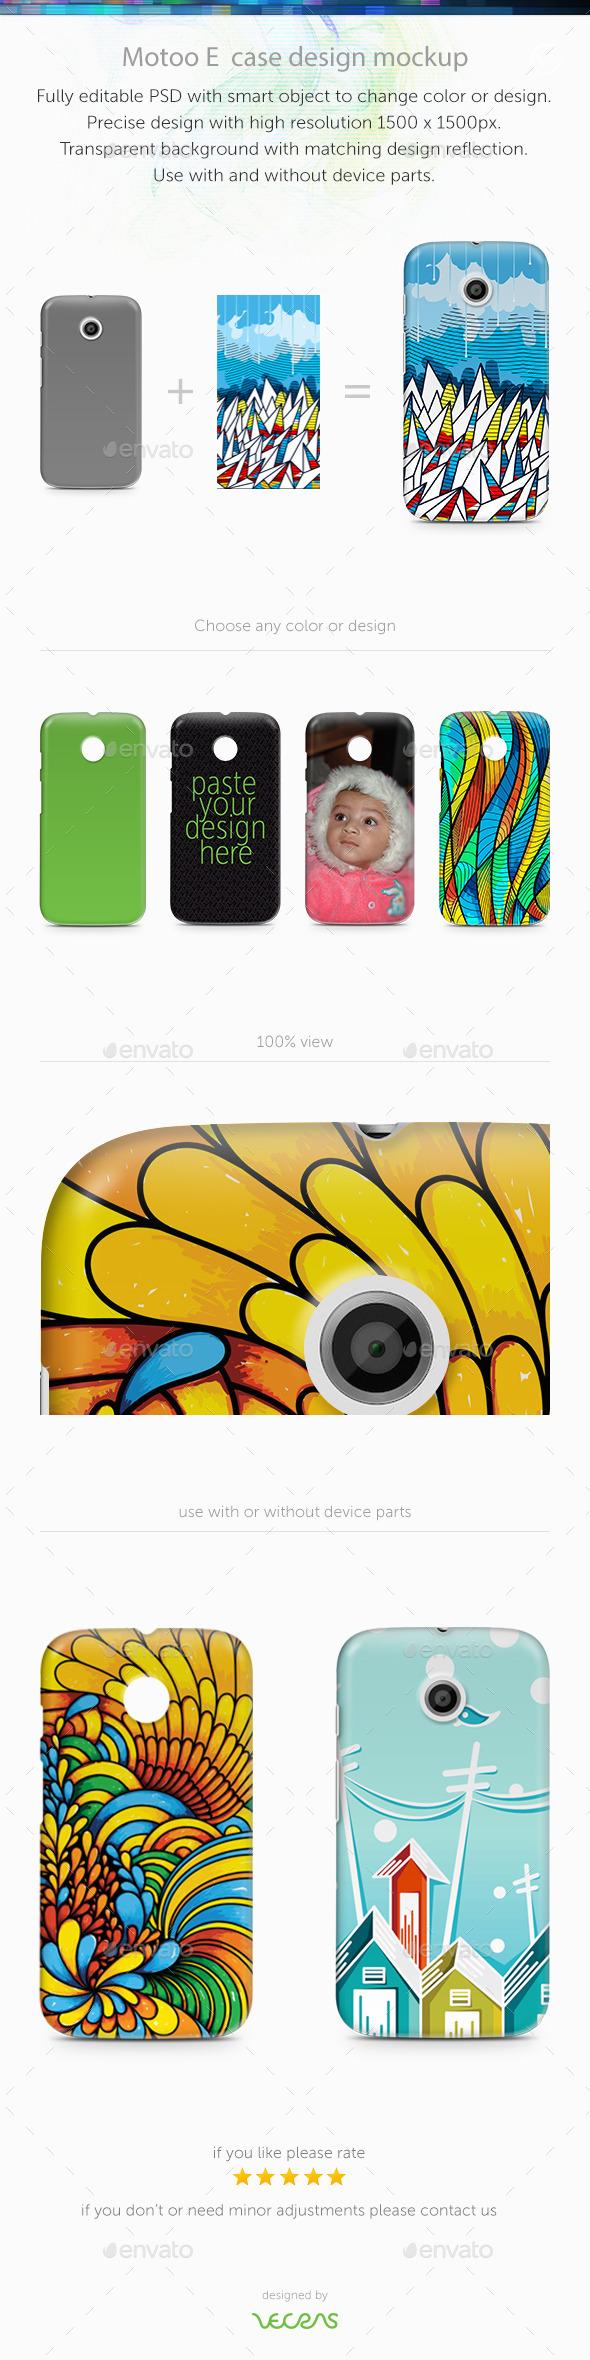 Motoo E Case Design Mockup